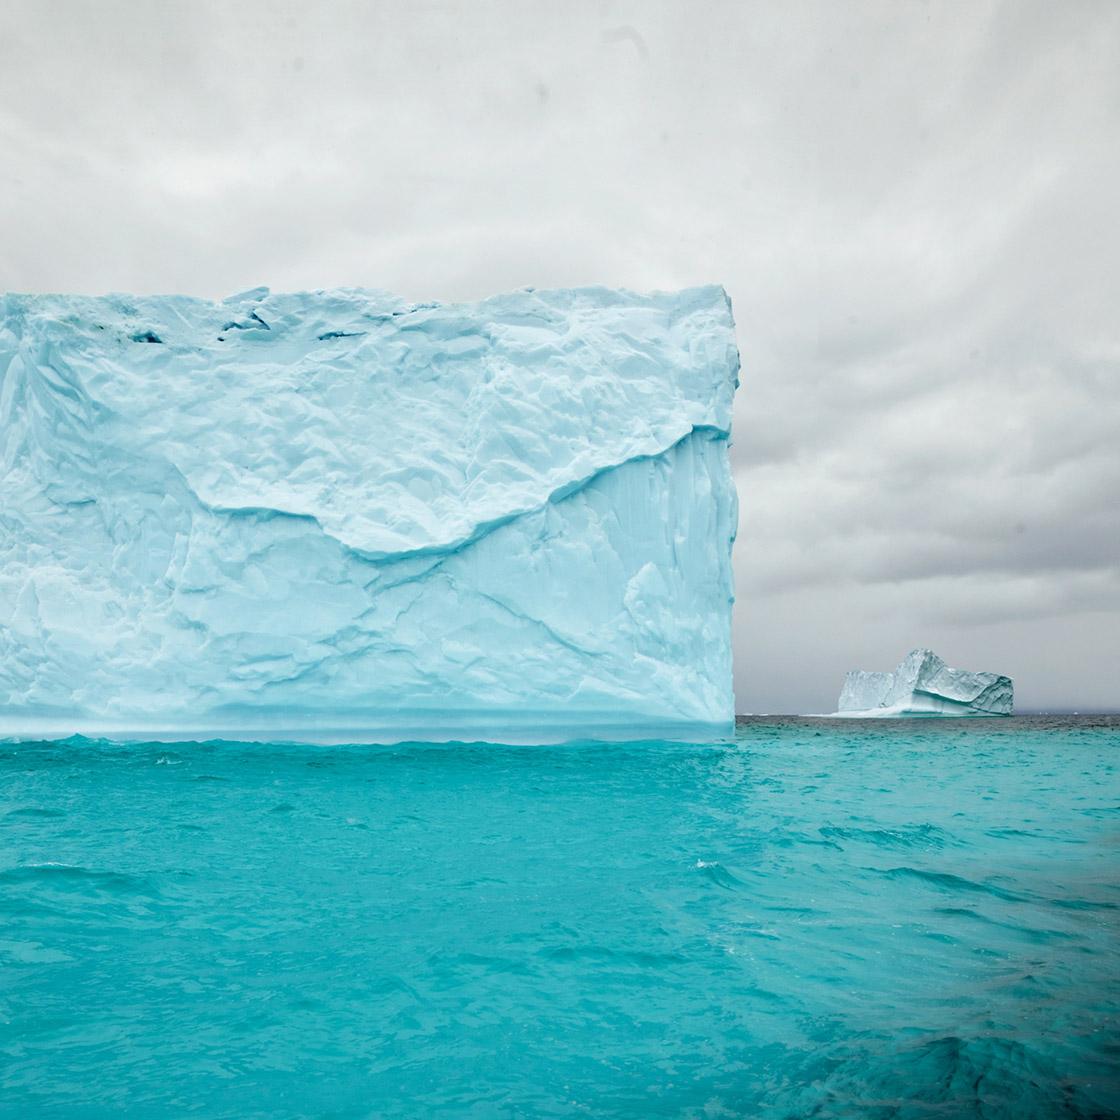 Iceberg 3, Greenalnd